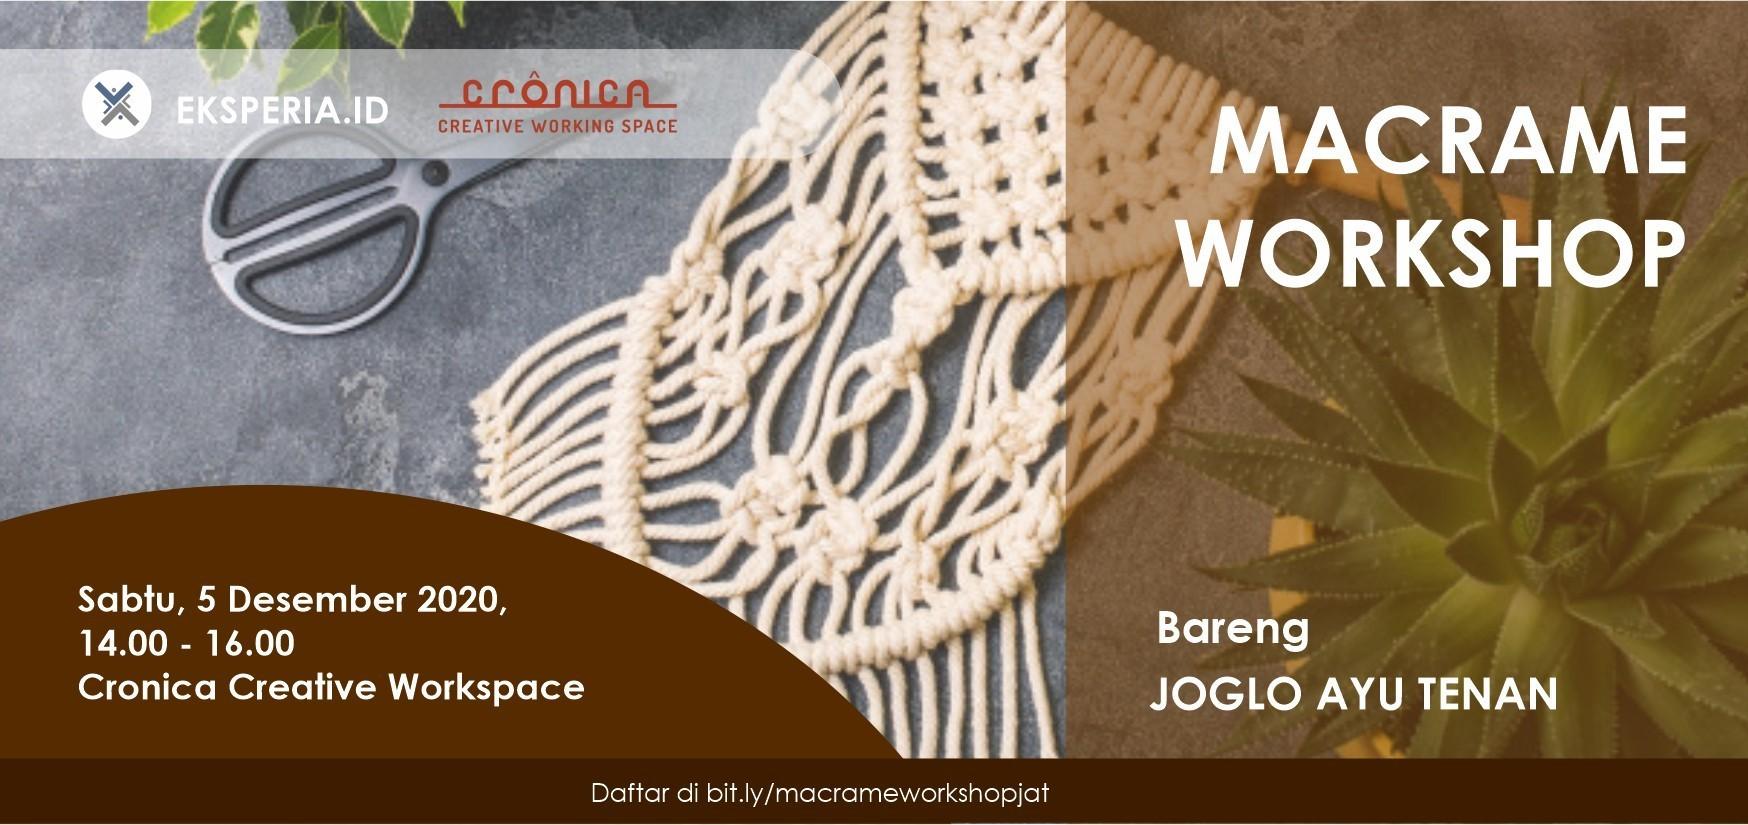 EKSPERIA.ID - Macrame Workshop bareng JOGLO AYU TENAN (ft Cronica Creative WorkSpace)